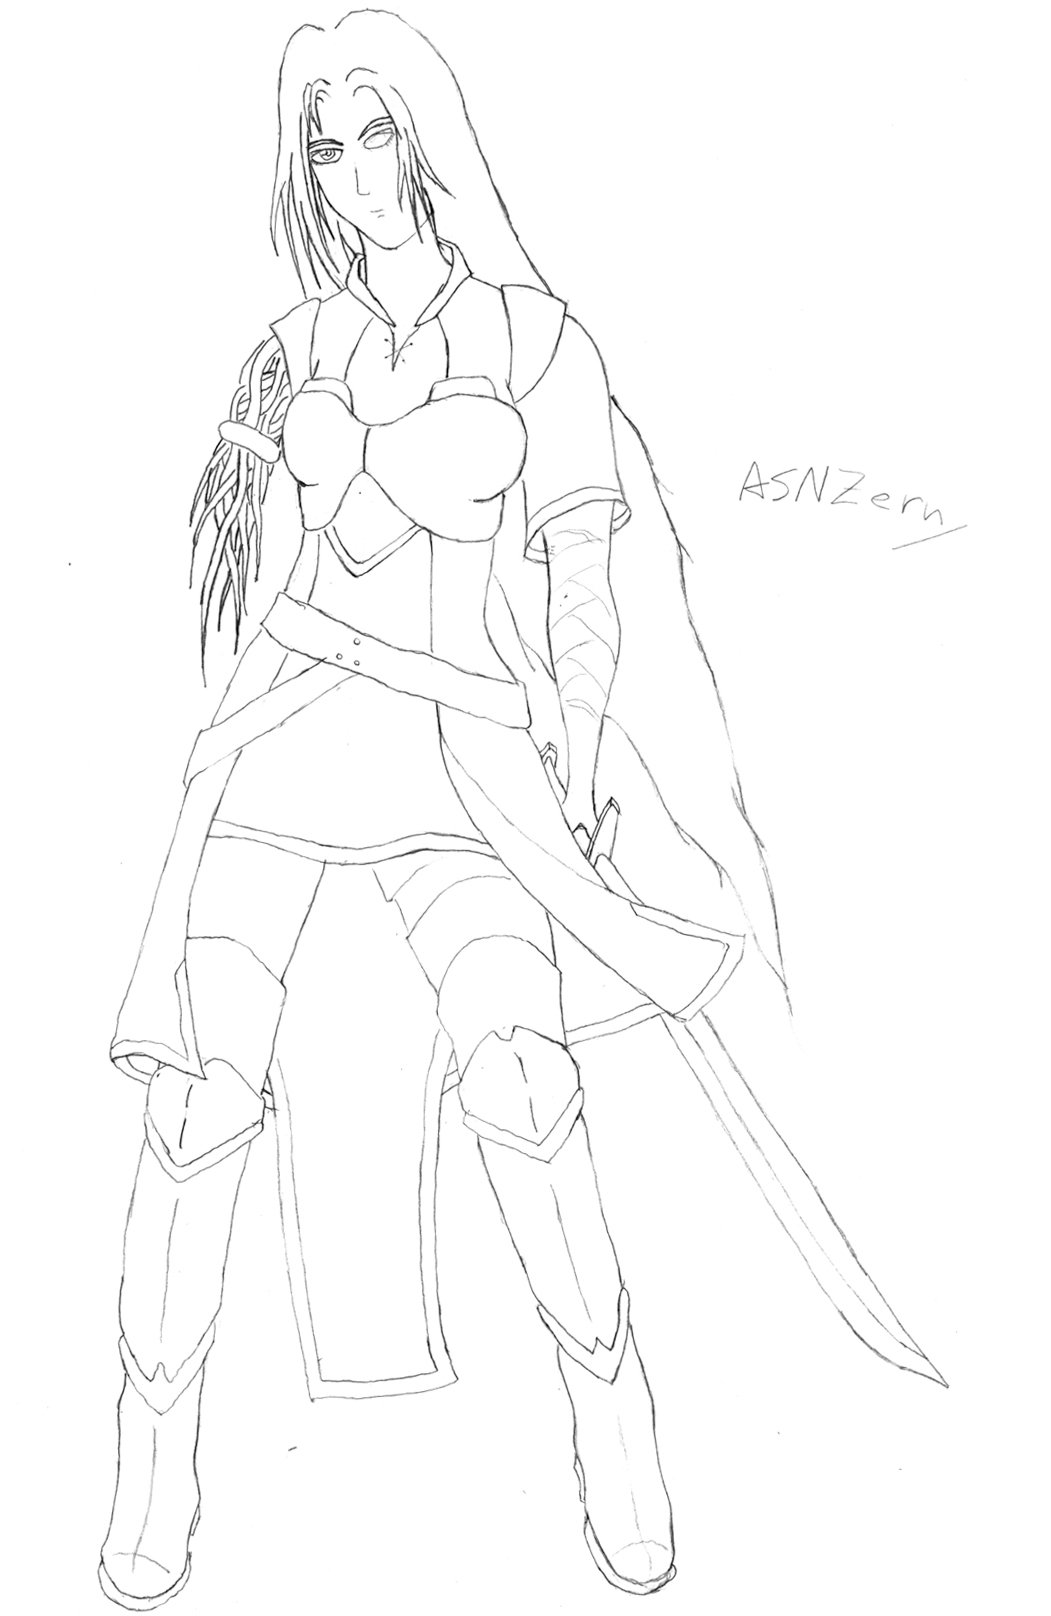 Fantasy Cyborg - Minimalist Line-art.